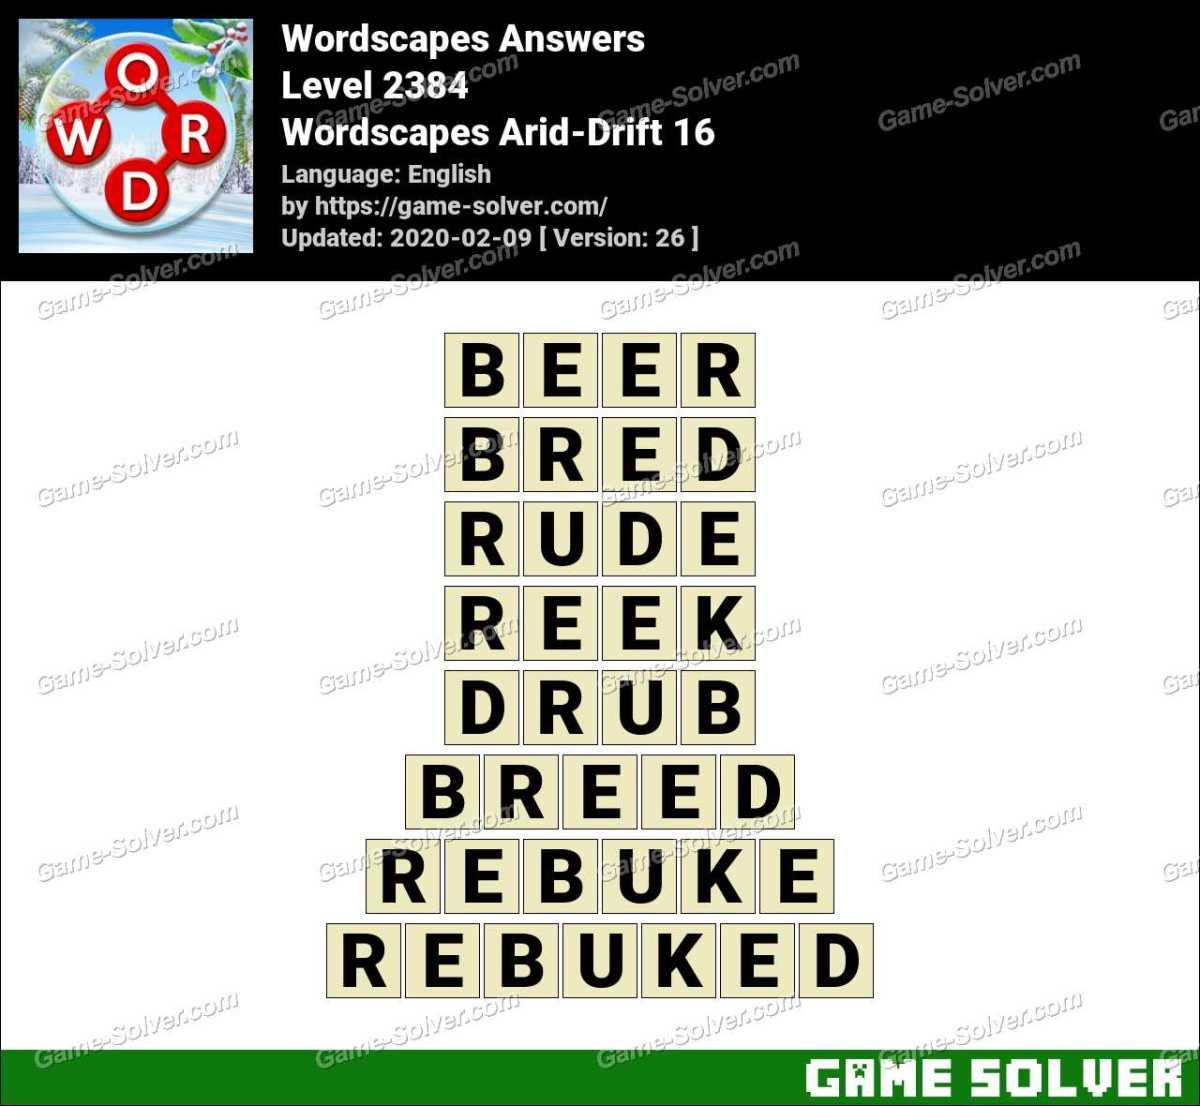 Wordscapes Arid-Drift 16 Answers